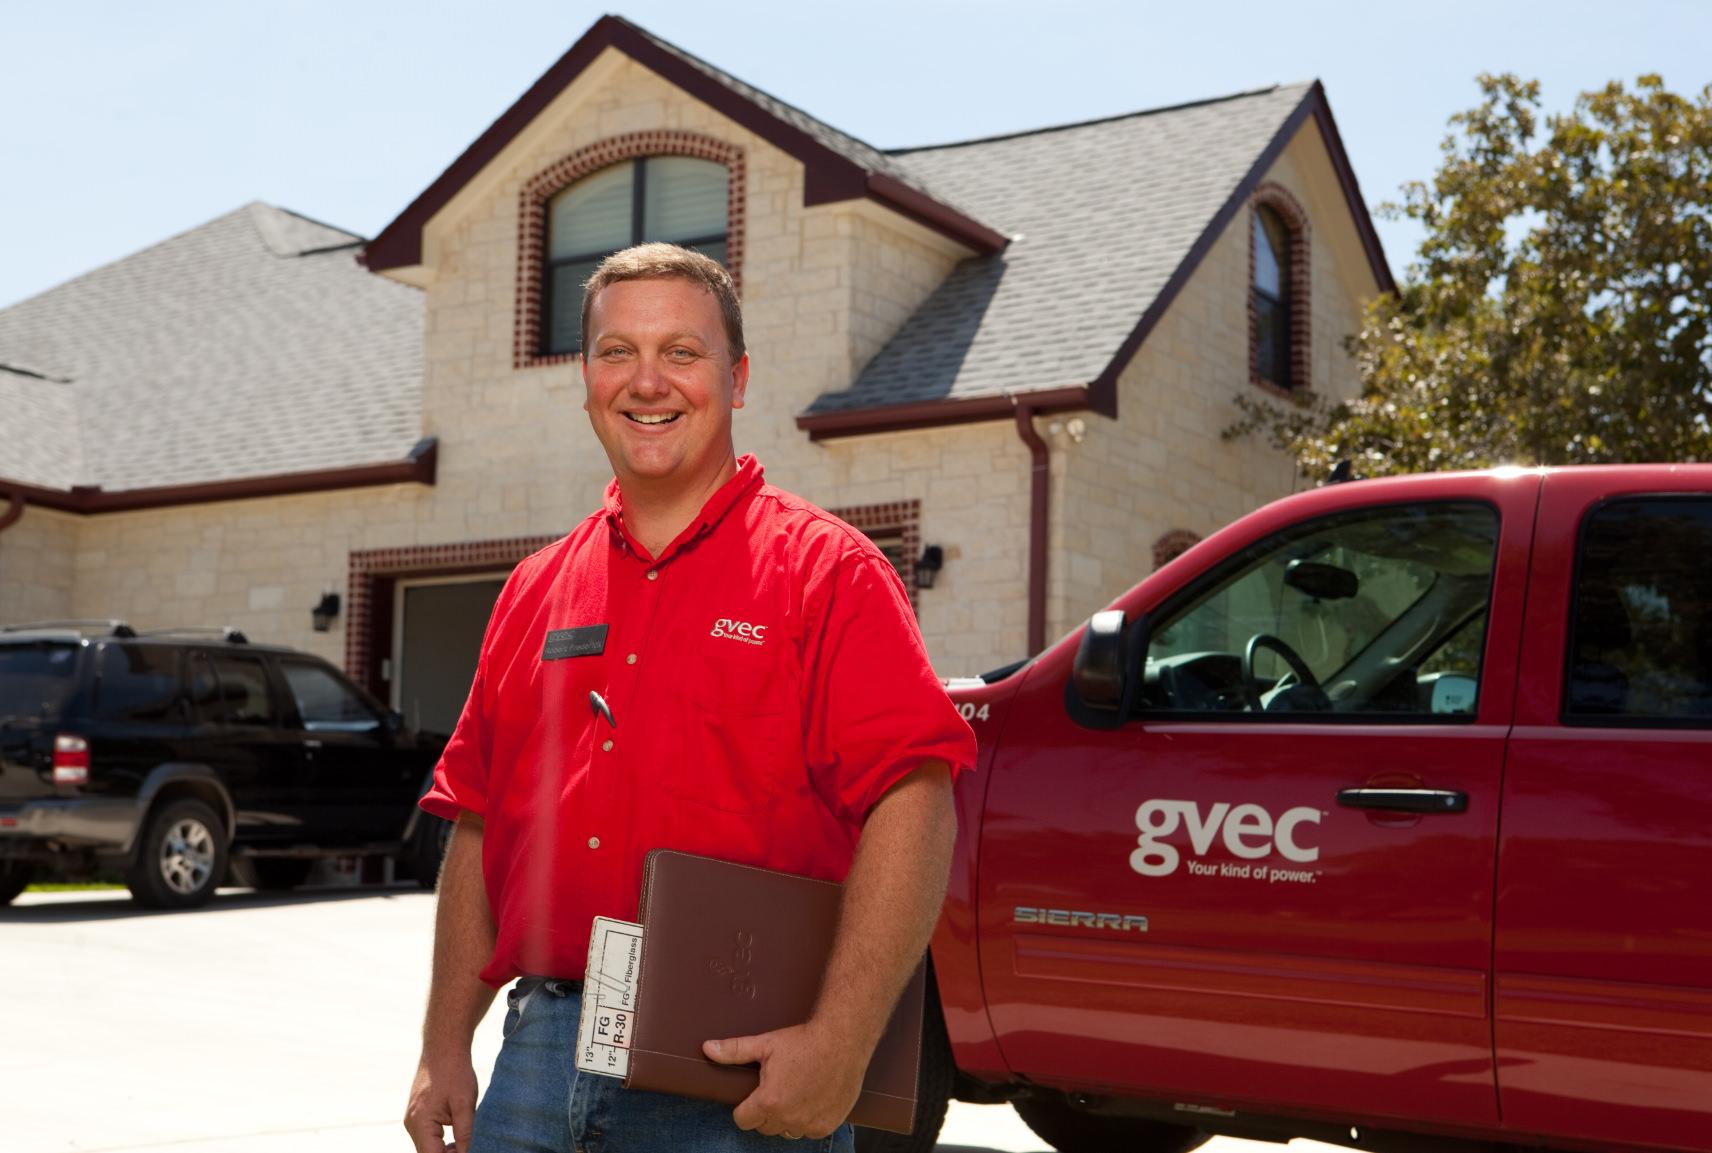 GVEC Energy Efficiency inspector standing next to truck